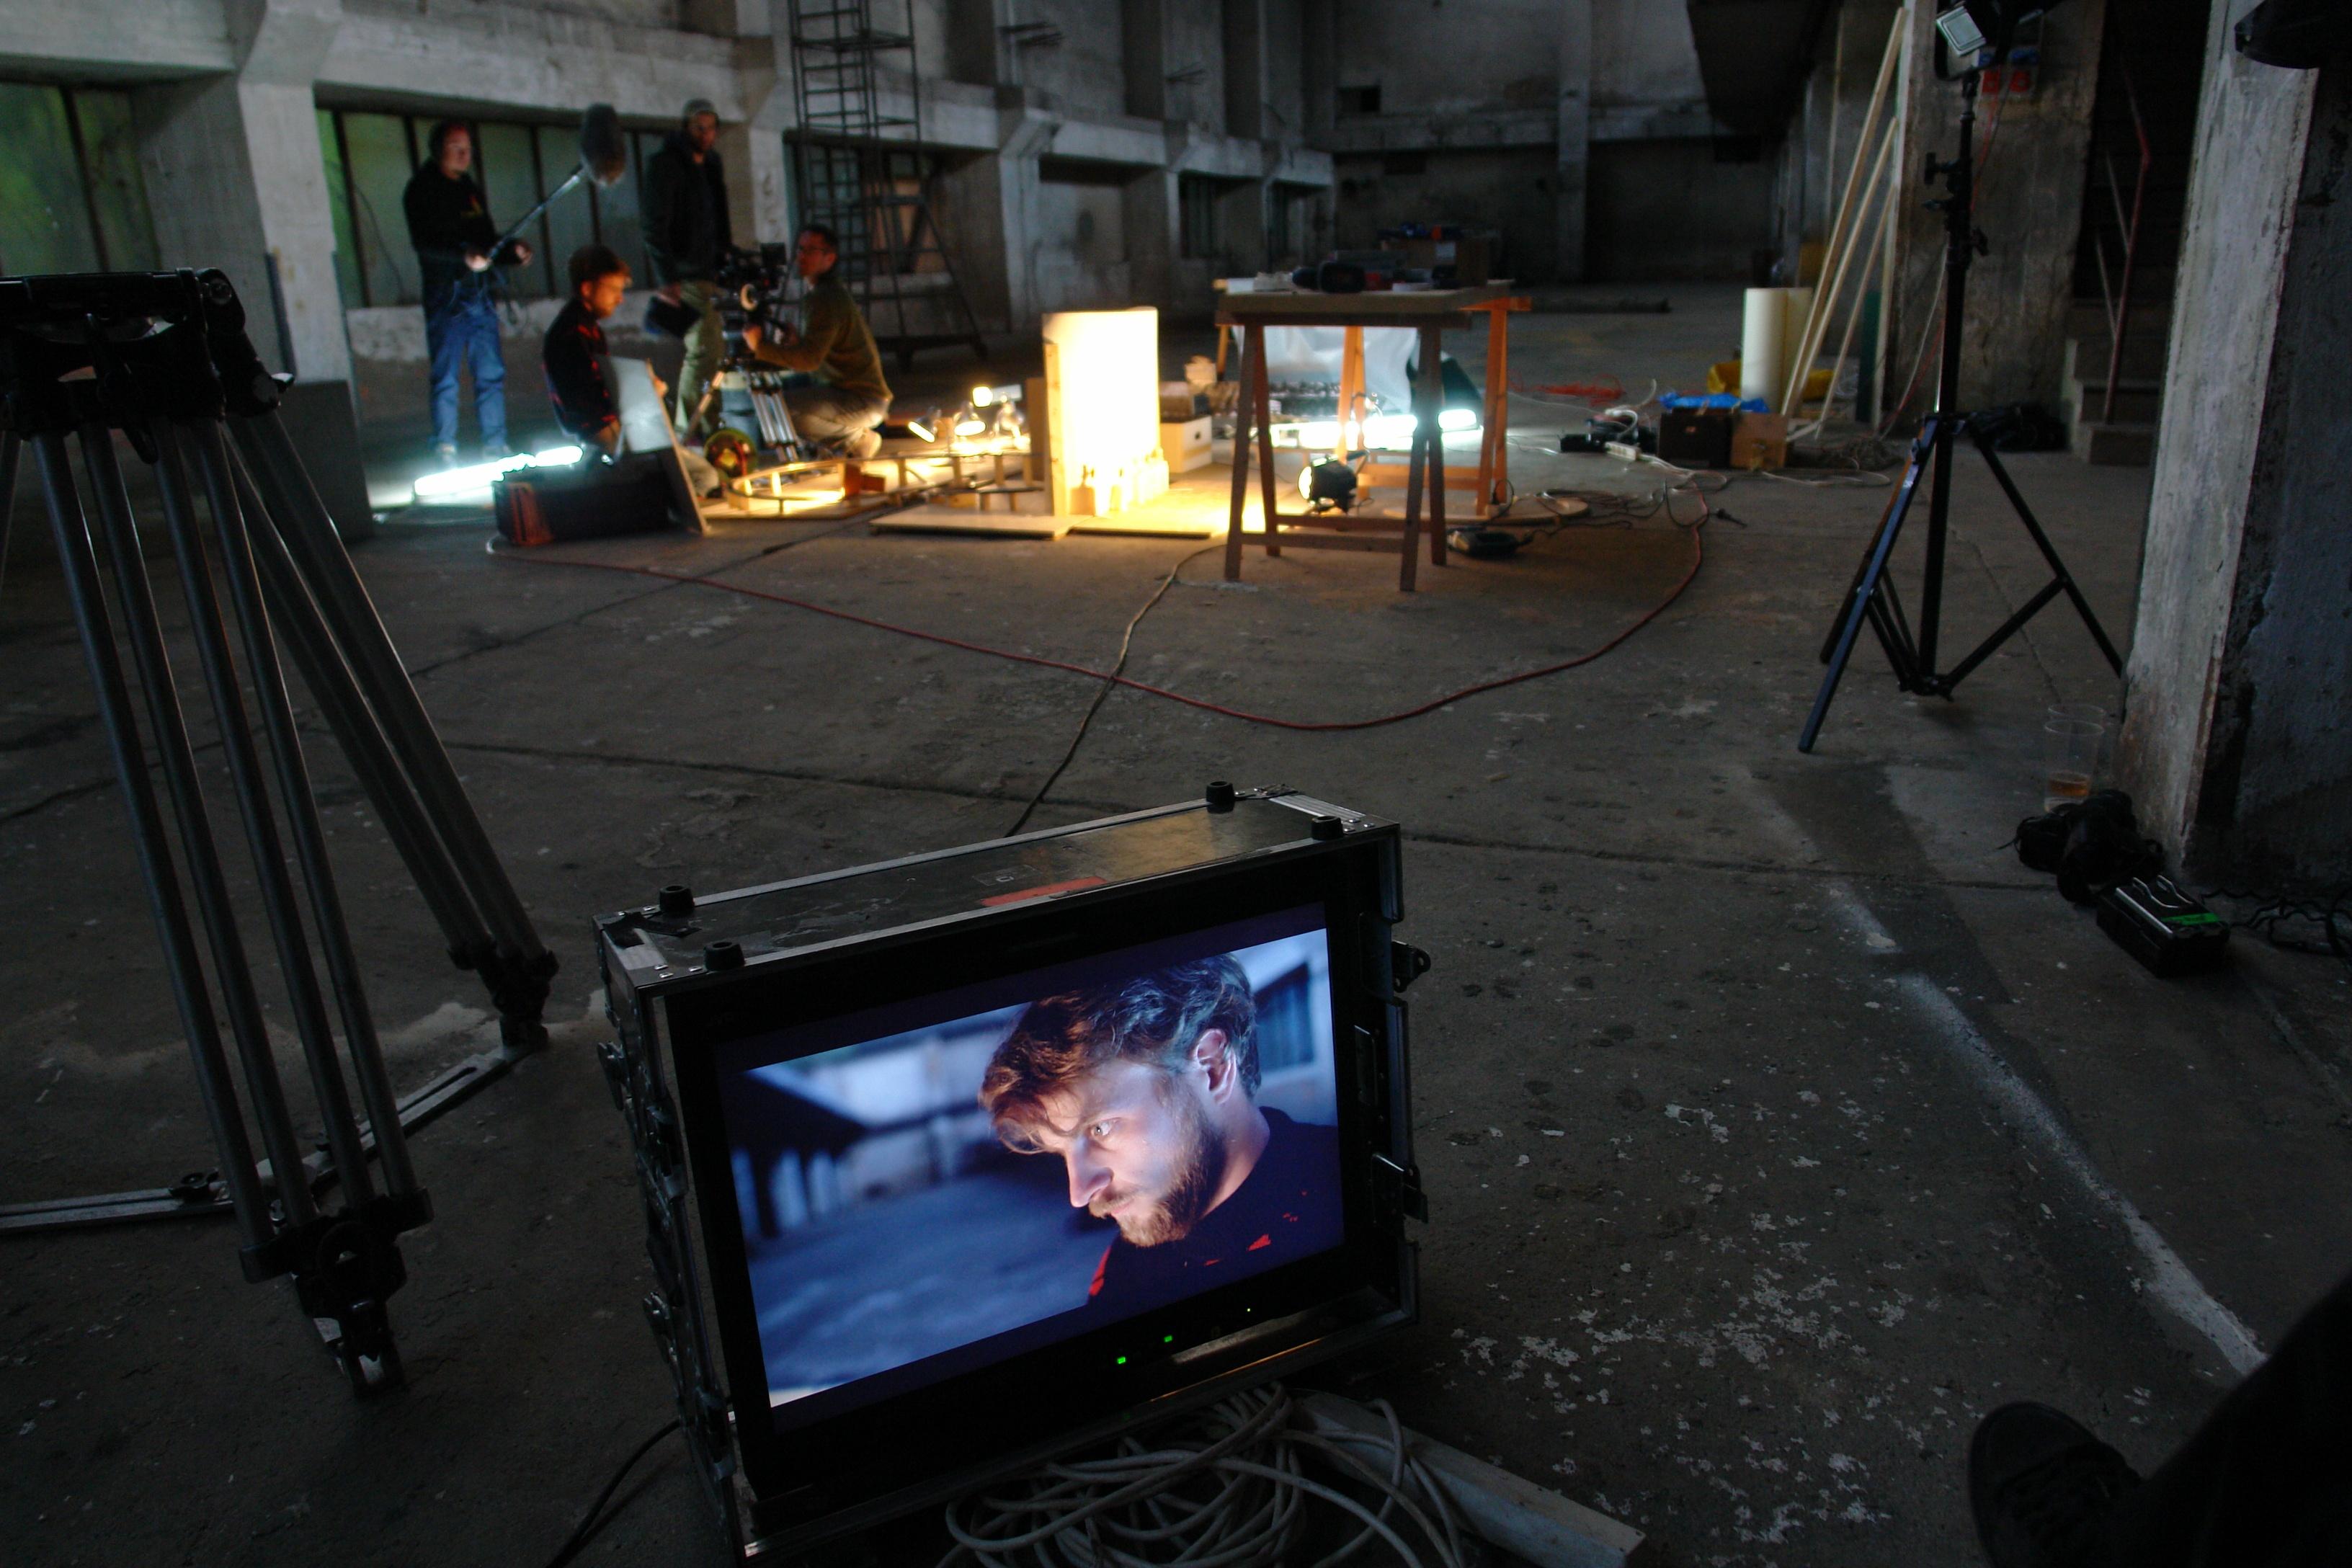 Visiting artist Tomas Svoboda: 'Like in a Movie'